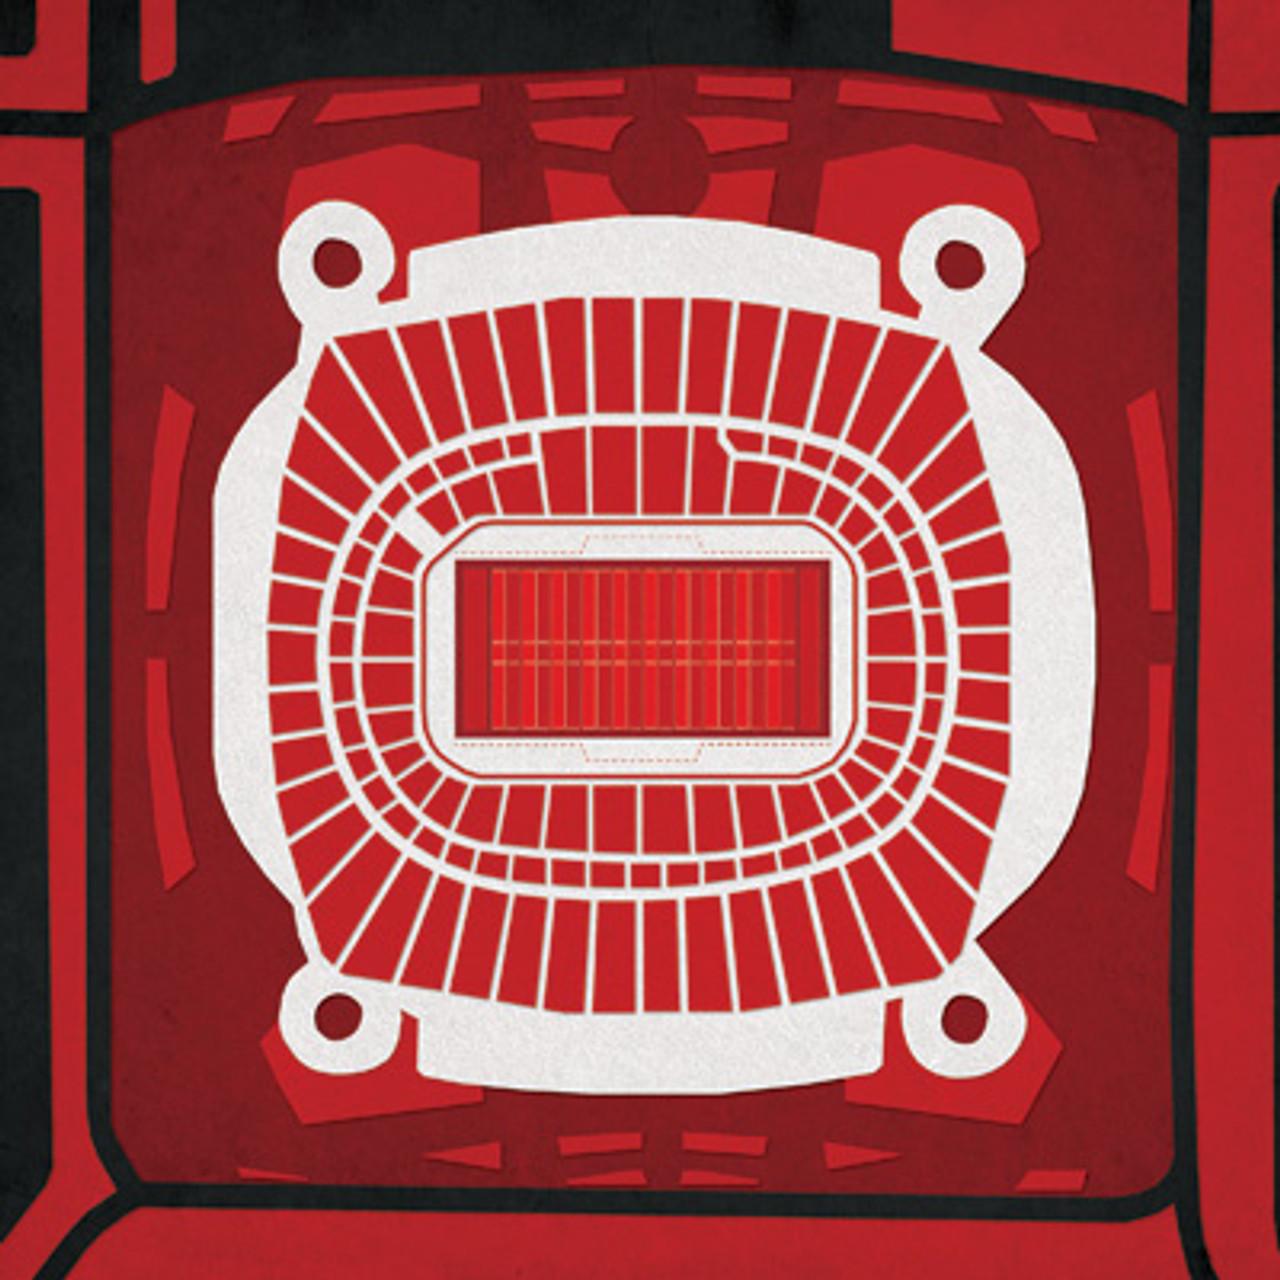 Arrowhead Stadium - Kansas City Chiefs City Print